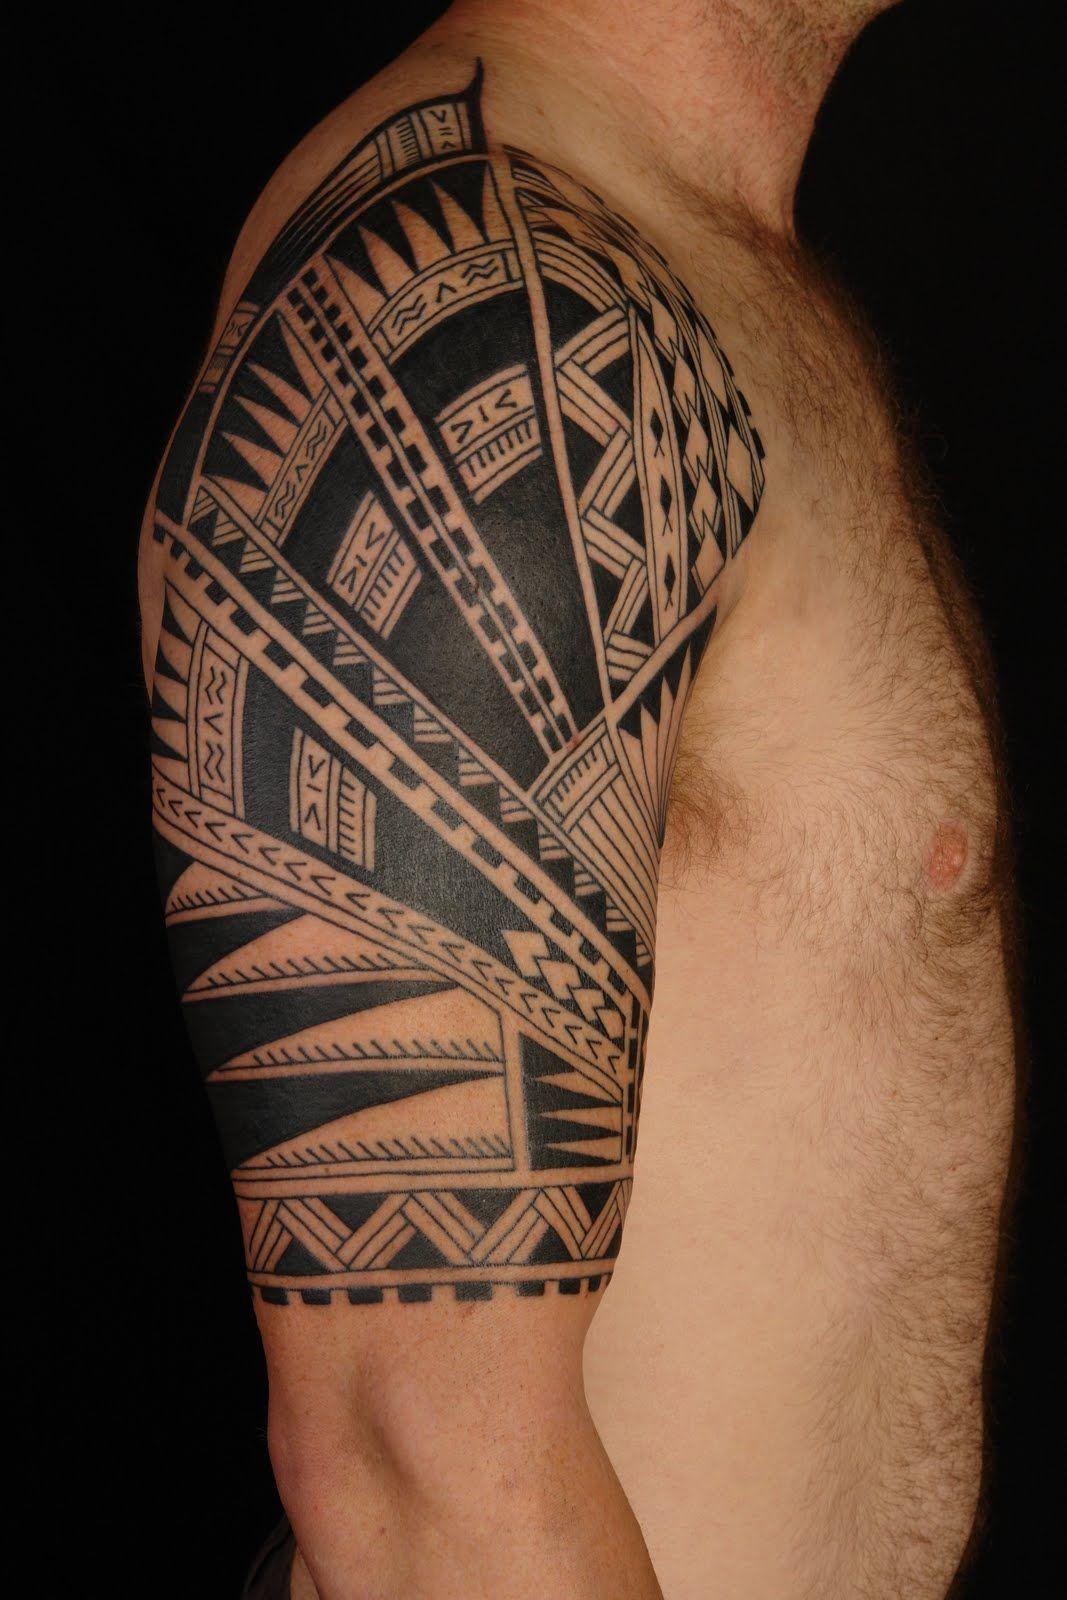 Tribal Aztec Tattoo Design Tribal Arm Half Sleeve Tattoo Http throughout dimensions 1067 X 1600